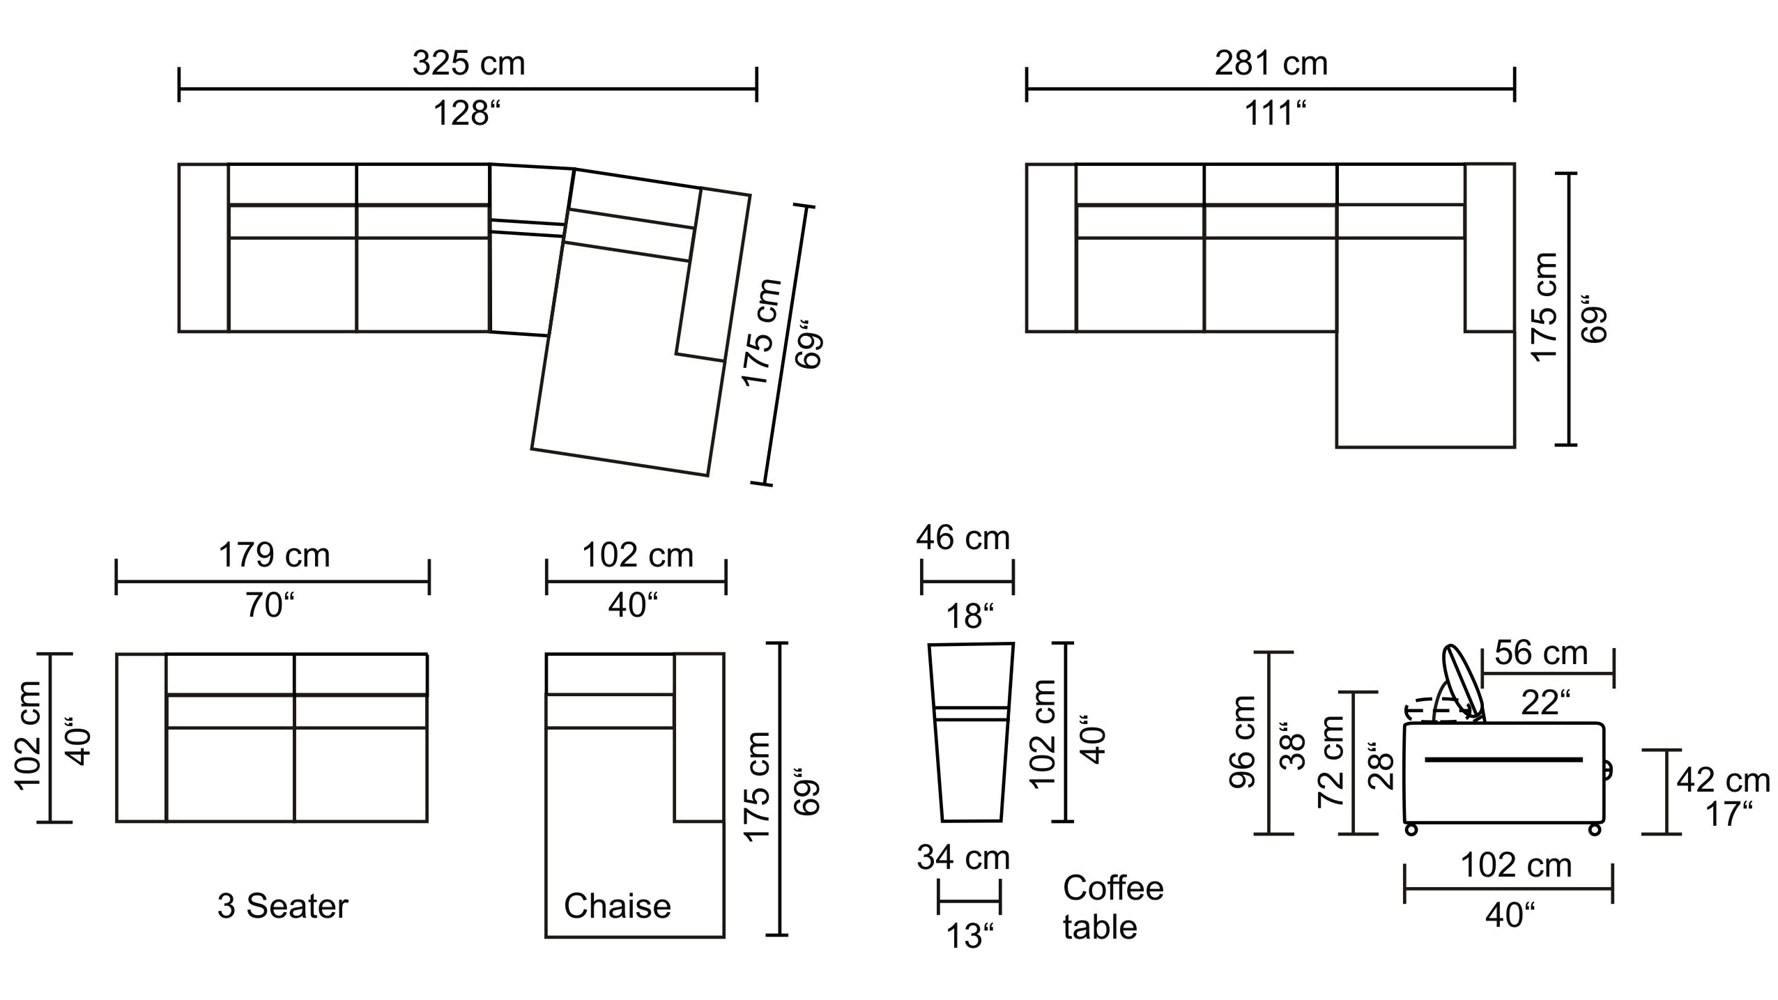 Ikea Ektorp 2 Seater Sofa Measurements – 28 Images – Ektorp Sofa Bed Pertaining To Measurements Sectional Sofas (Image 6 of 10)